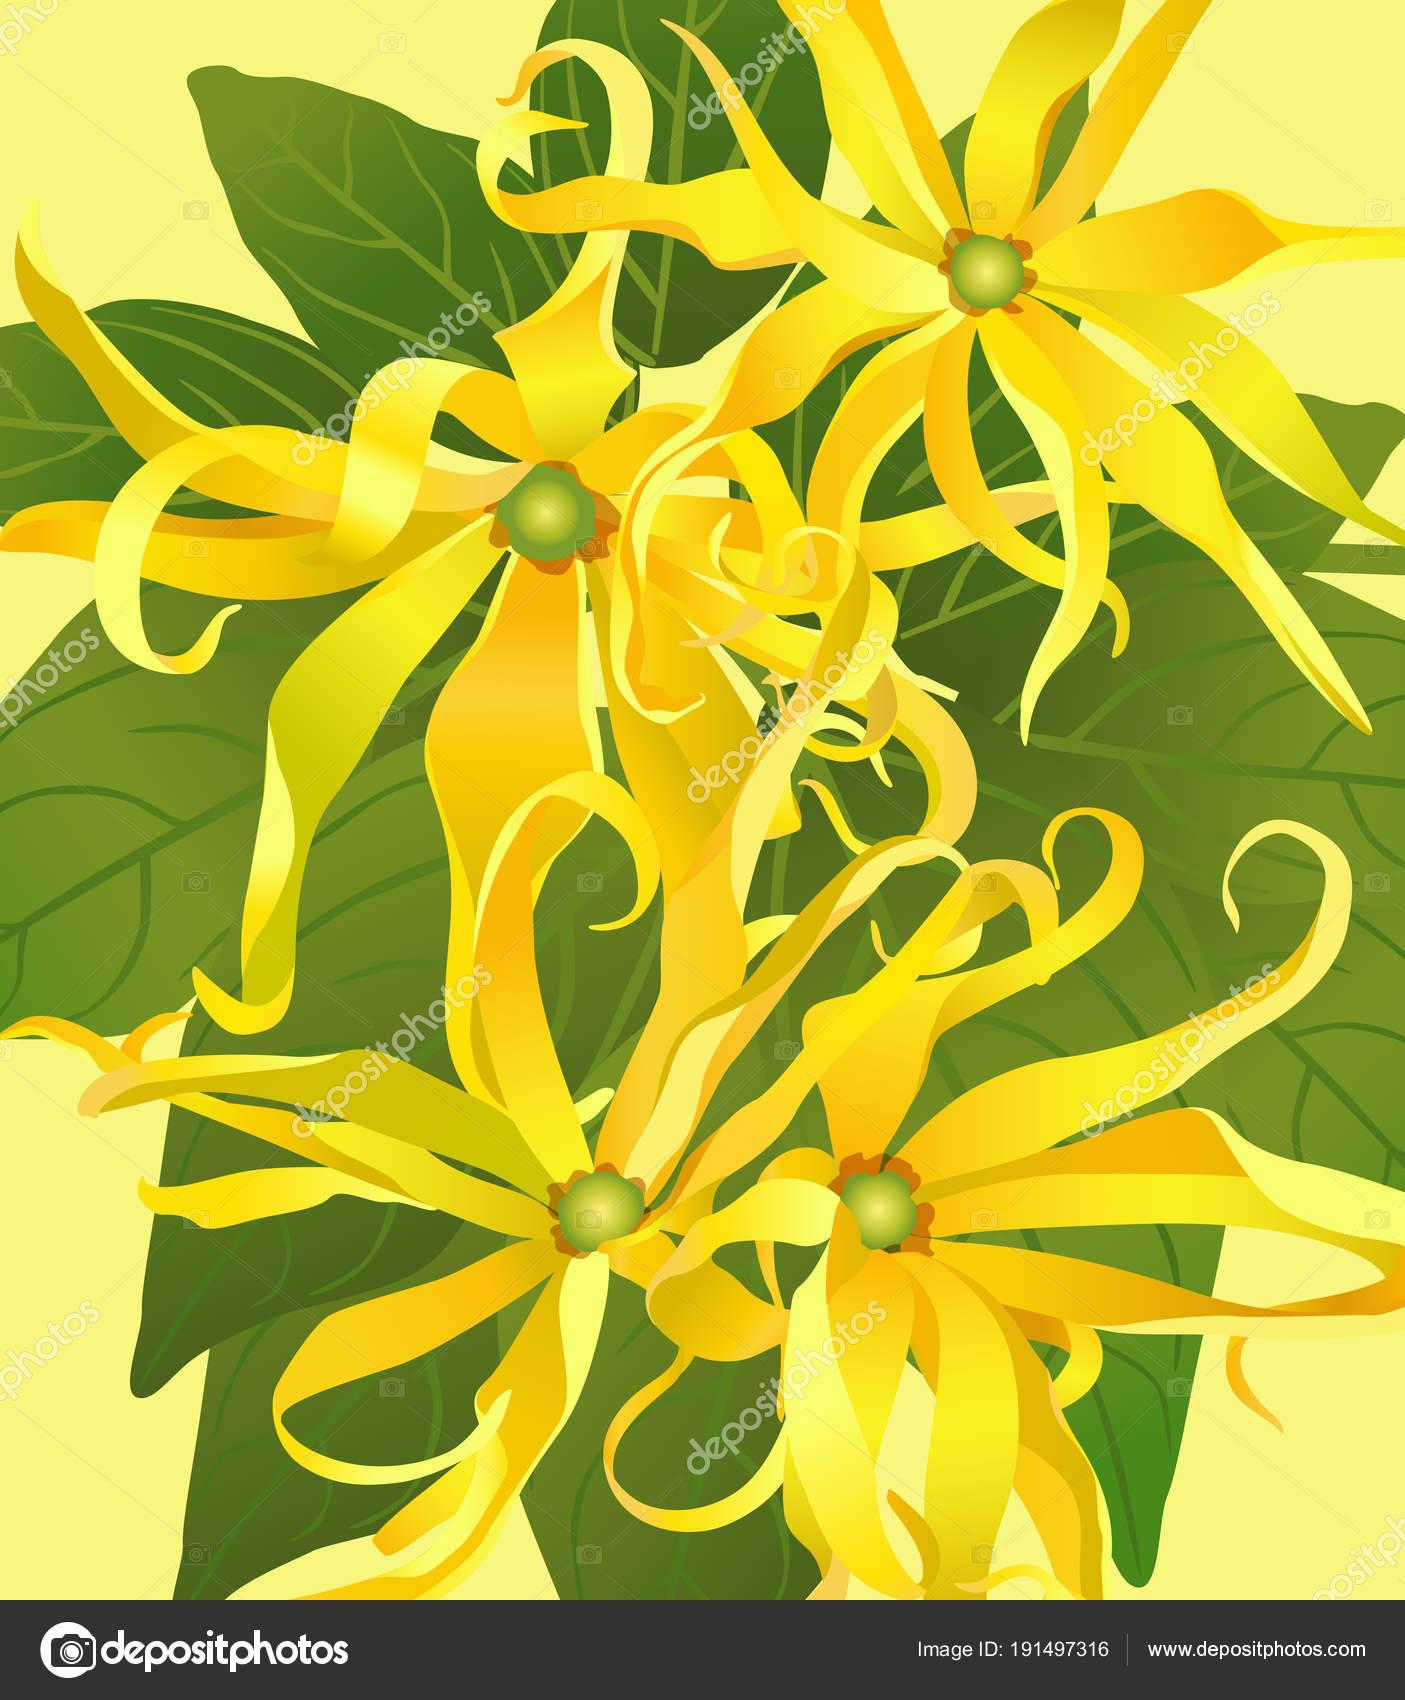 Fiori Ylang Ylang.Background From Flowers Ylang Ylang Stock Vector C Svetik 191497316